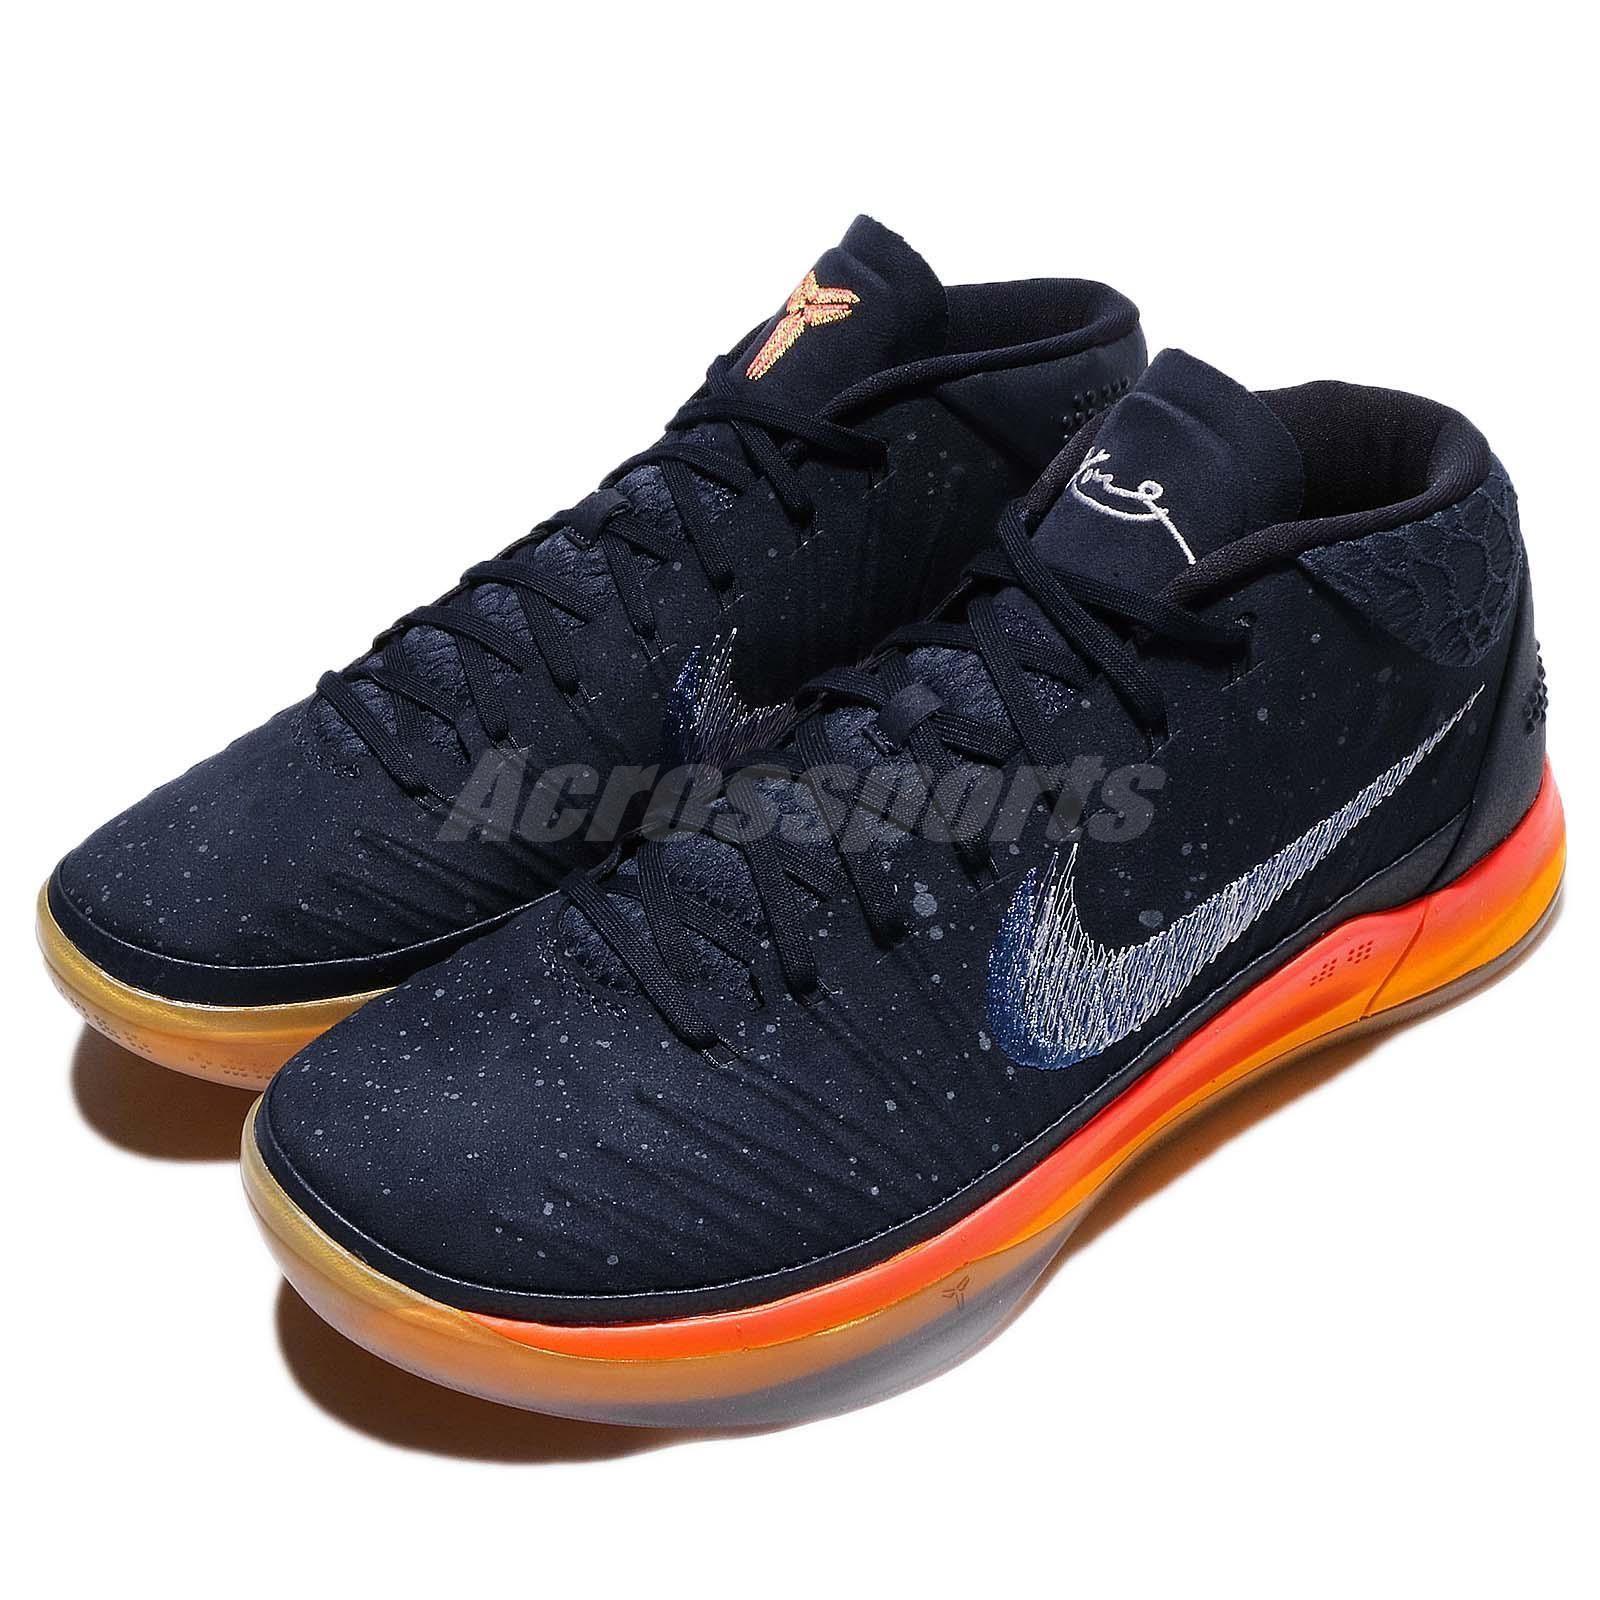 promo code e8ed3 04bd1 Nike Kobe AD EP A.D. Mid Rise Mamba Bryant Obsidian Orange Asia Men  922484-401